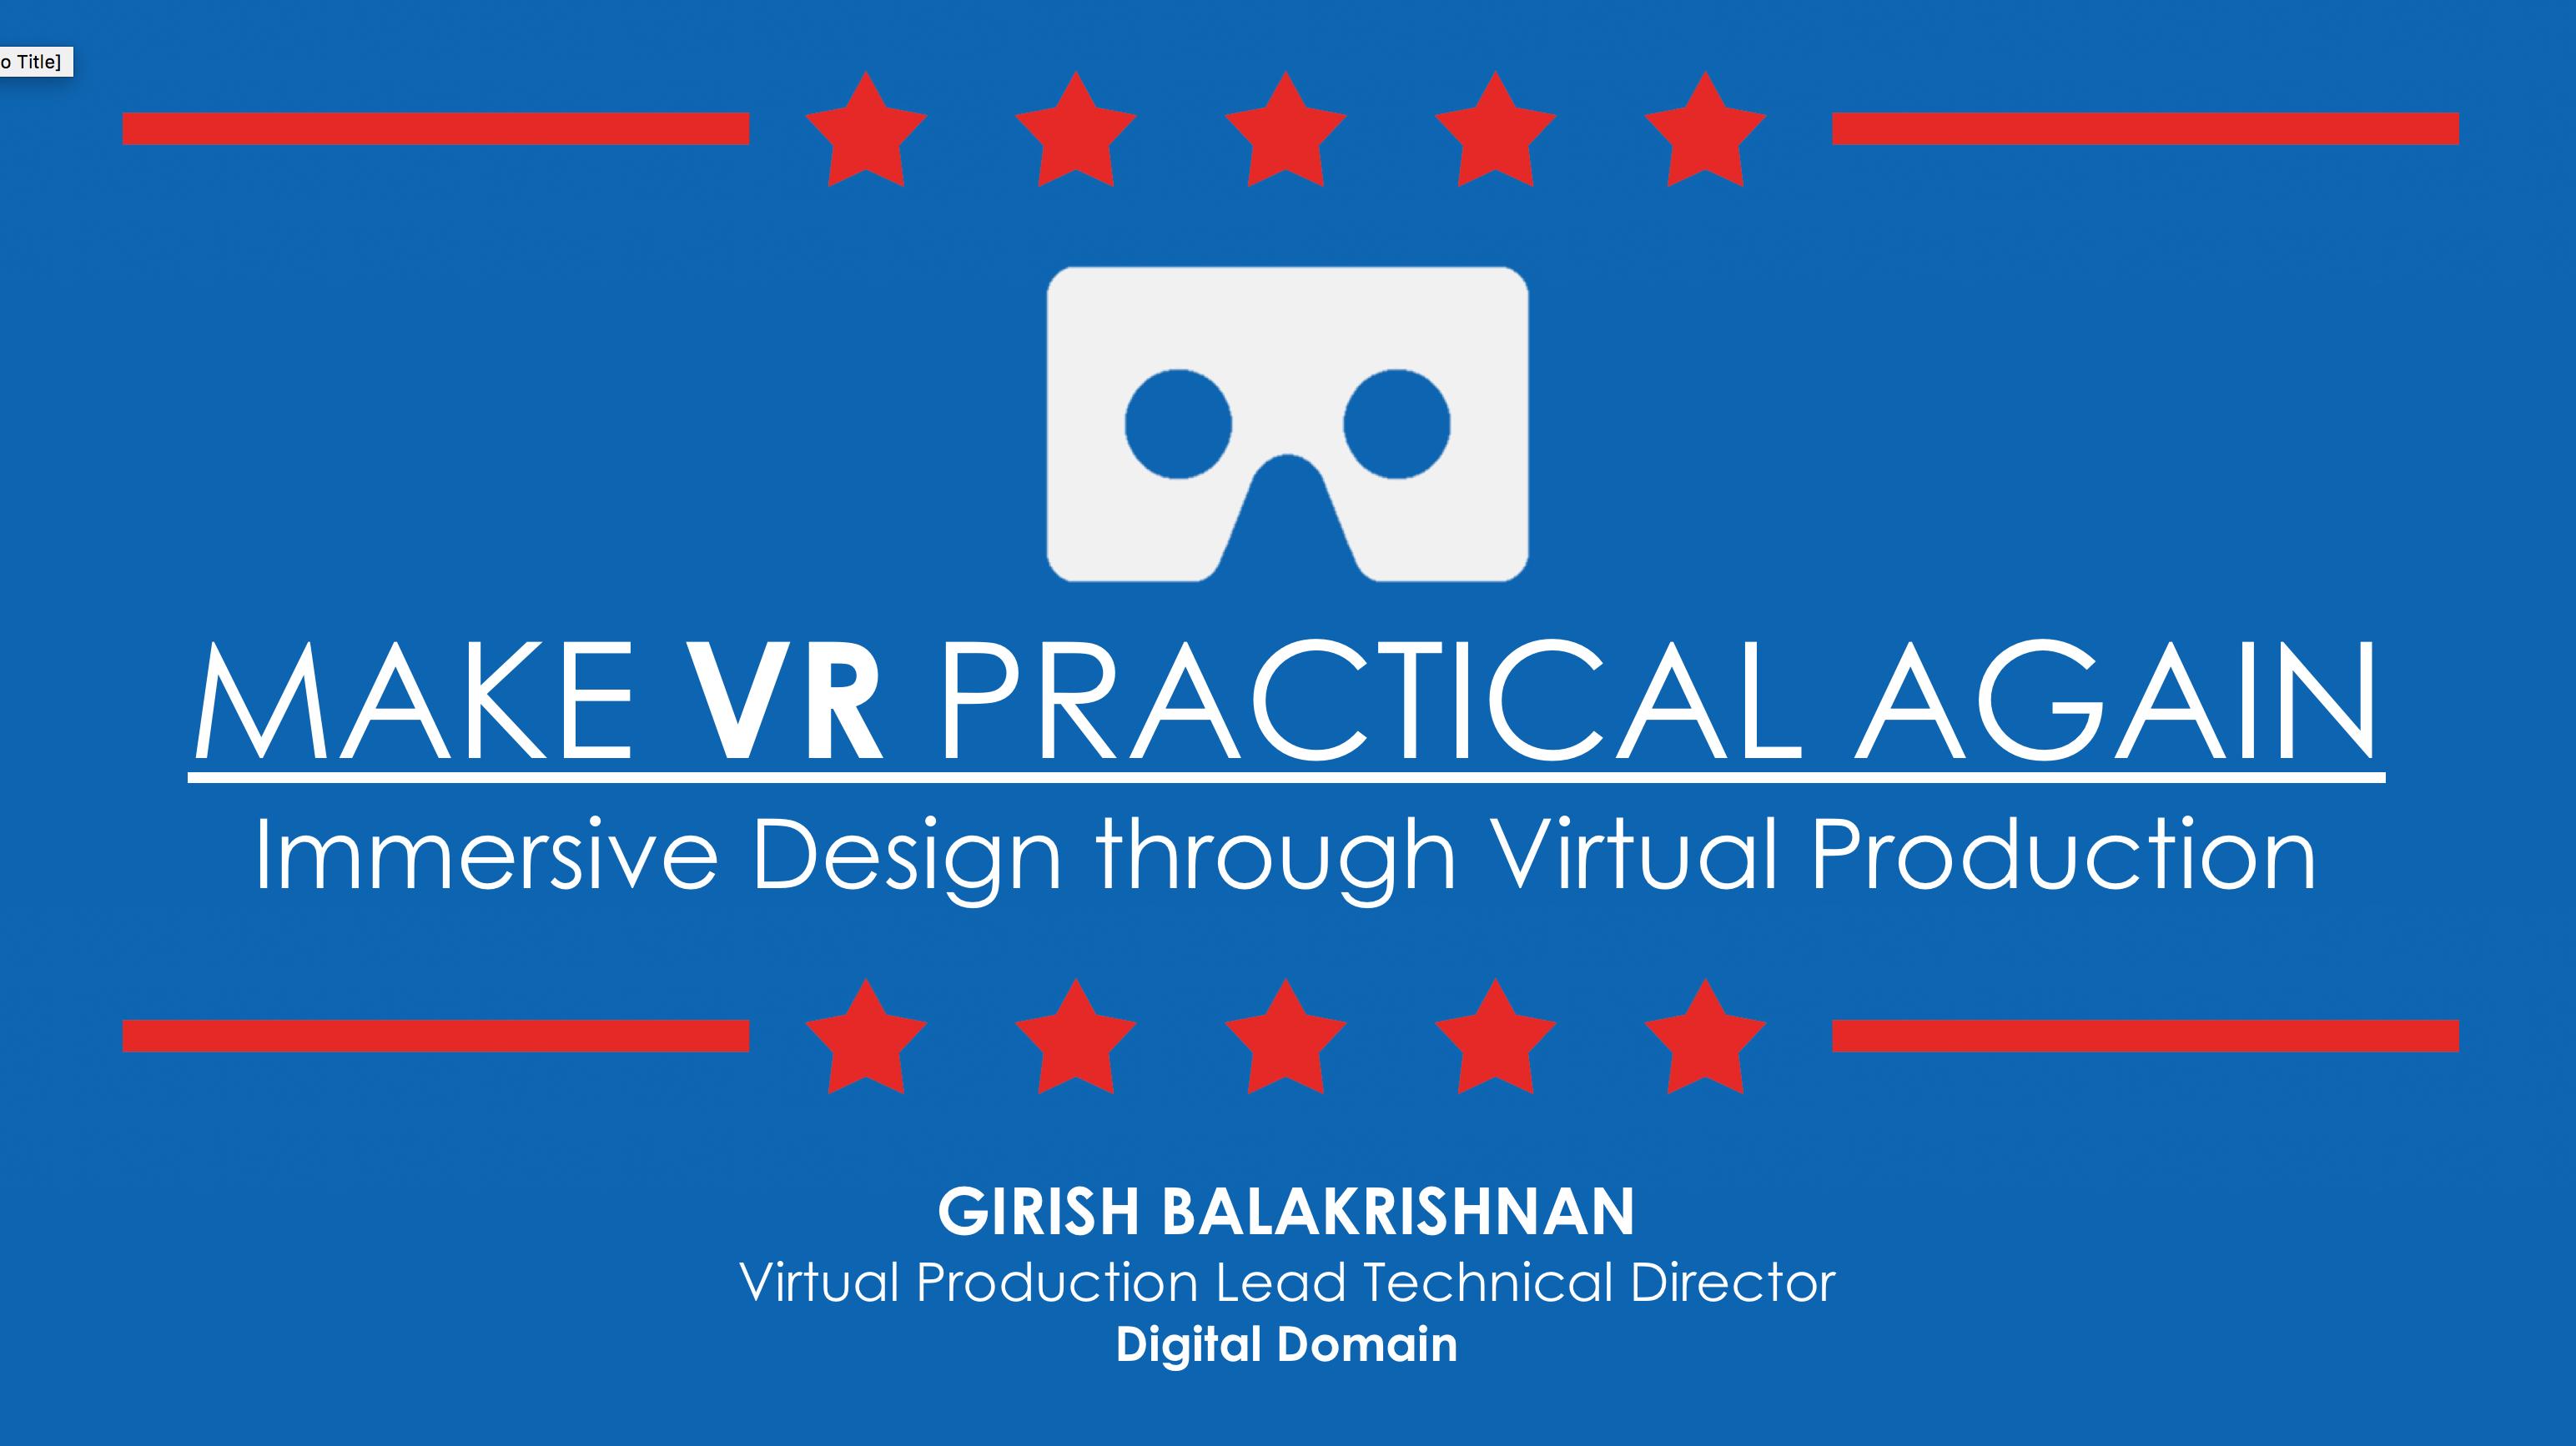 Make VR Practical Again